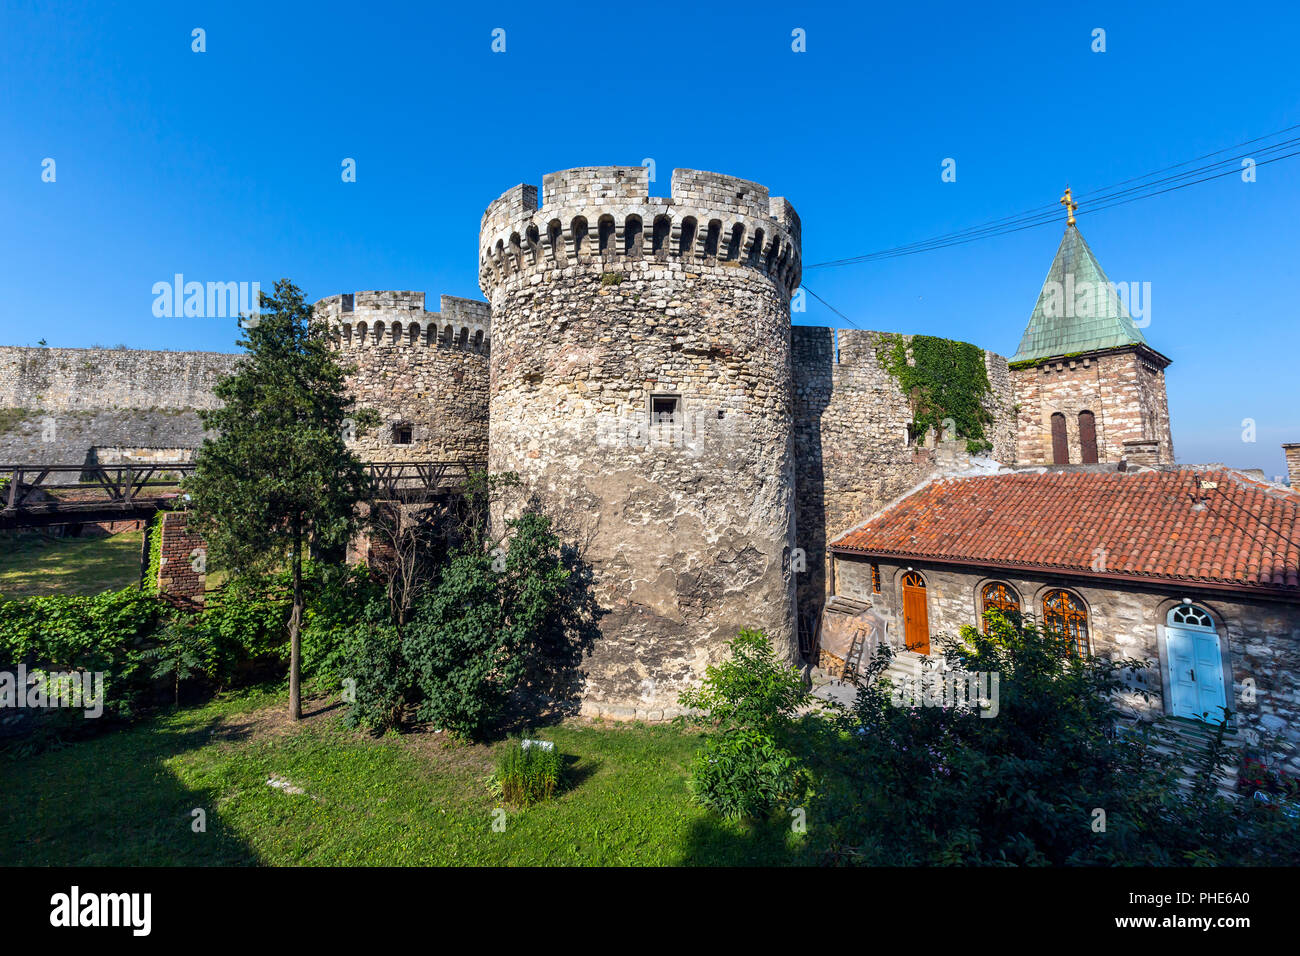 Famous fortress Kalemegdan in Belgrade - Stock Image